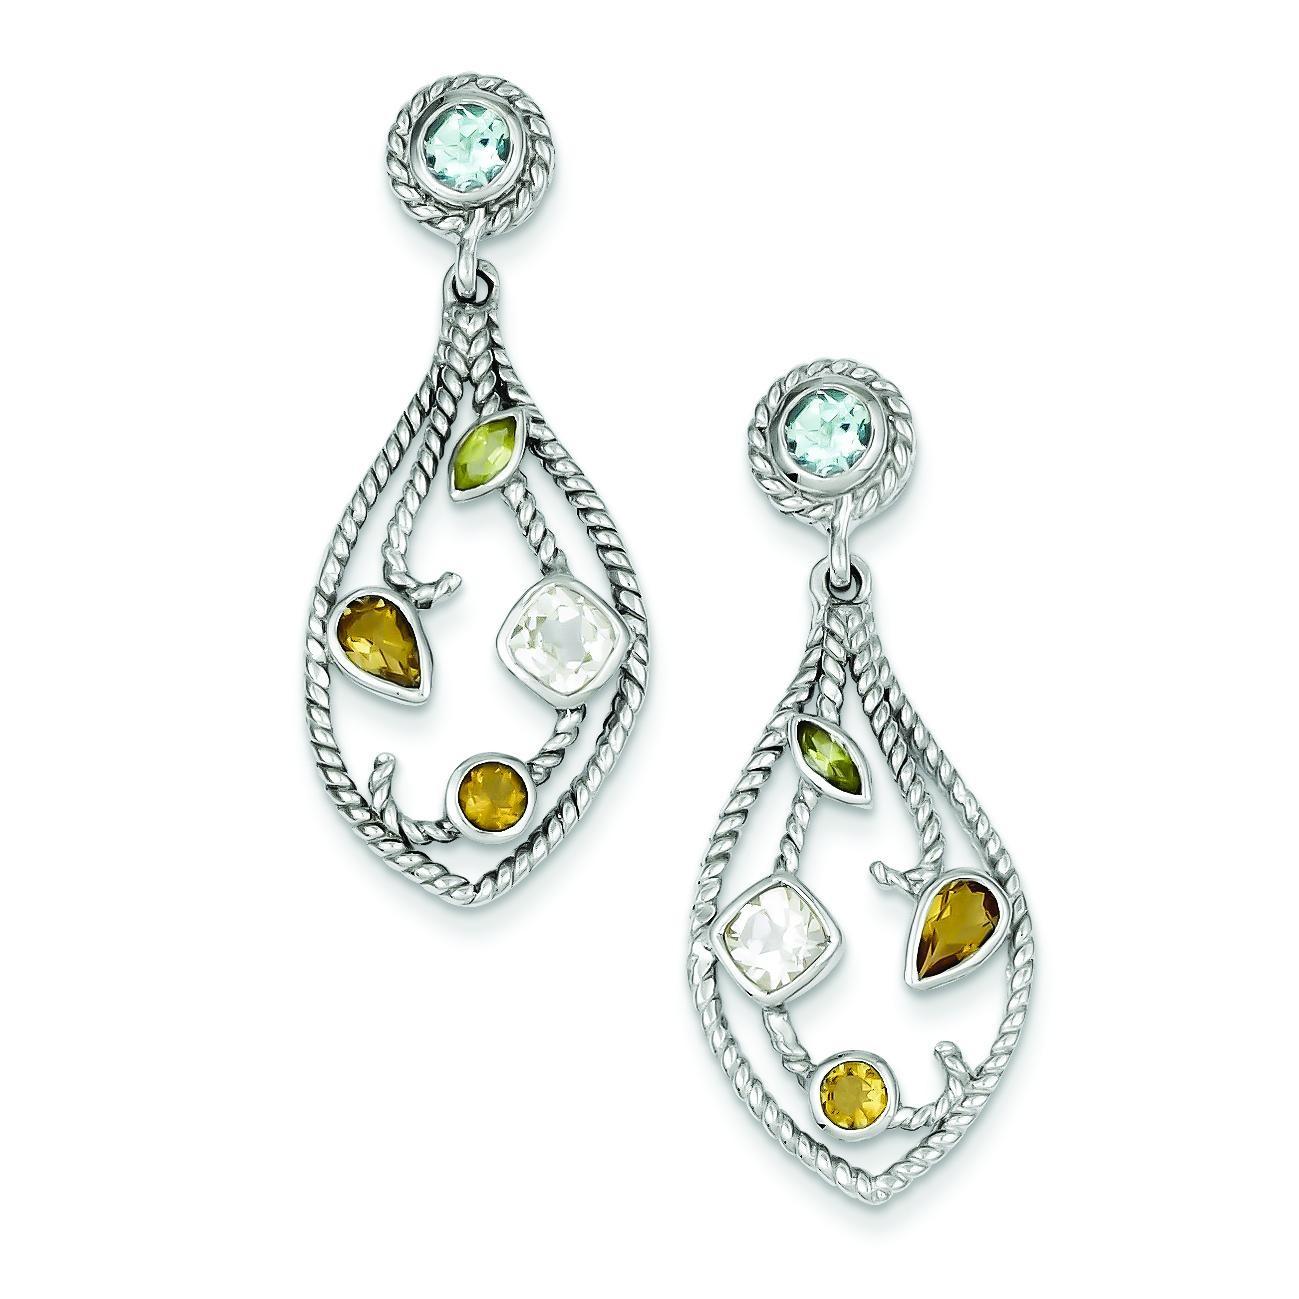 CZ Multi Color Gemstone Post Dangle Earrings in Sterling Silver